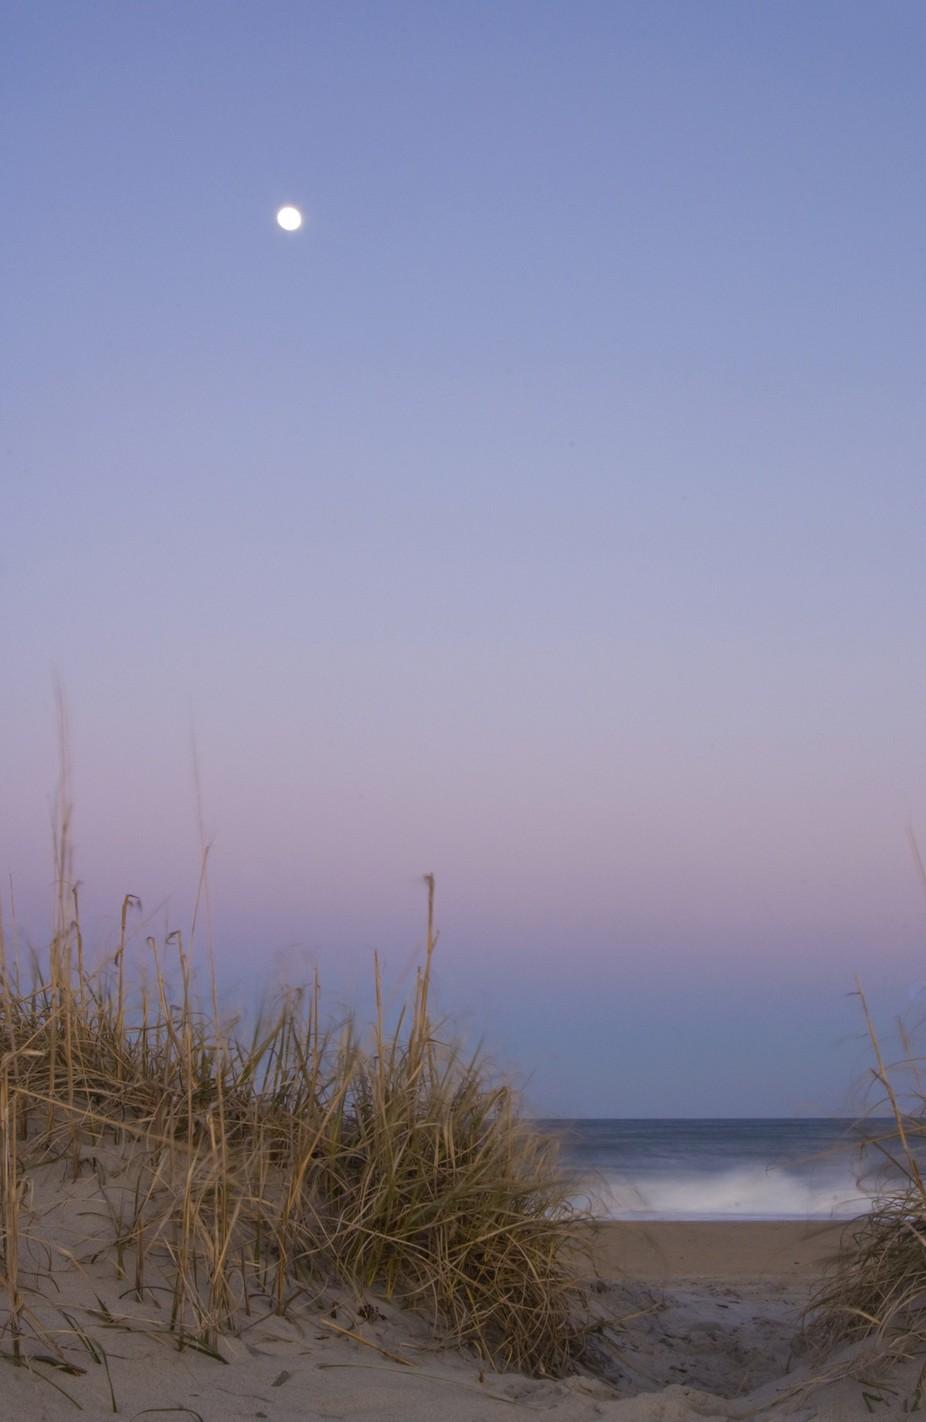 A nearly full moon rises above the Atlantic Ocean at Buxton, North Carolina